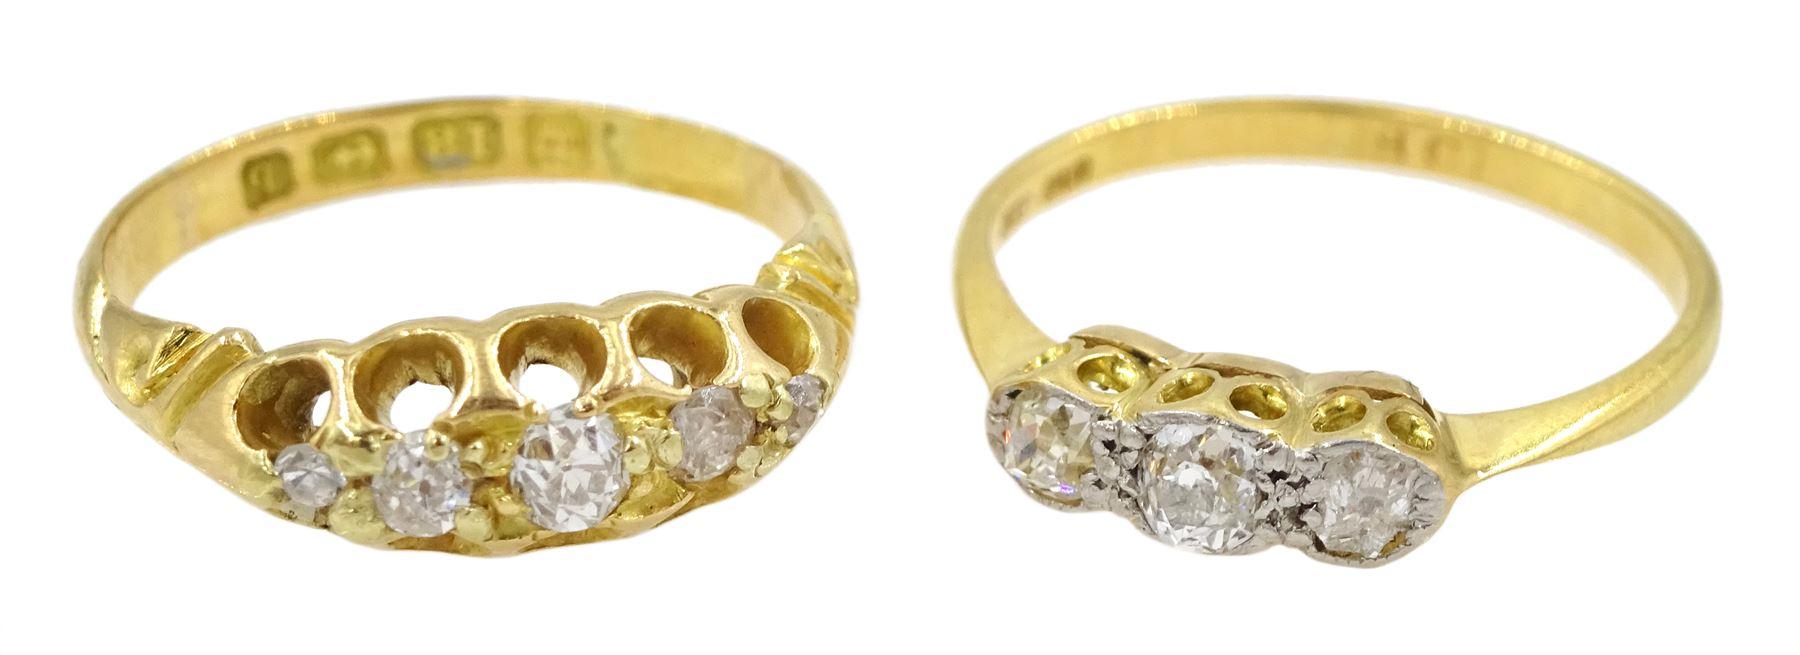 14ct gold old cut diamond three stone ring